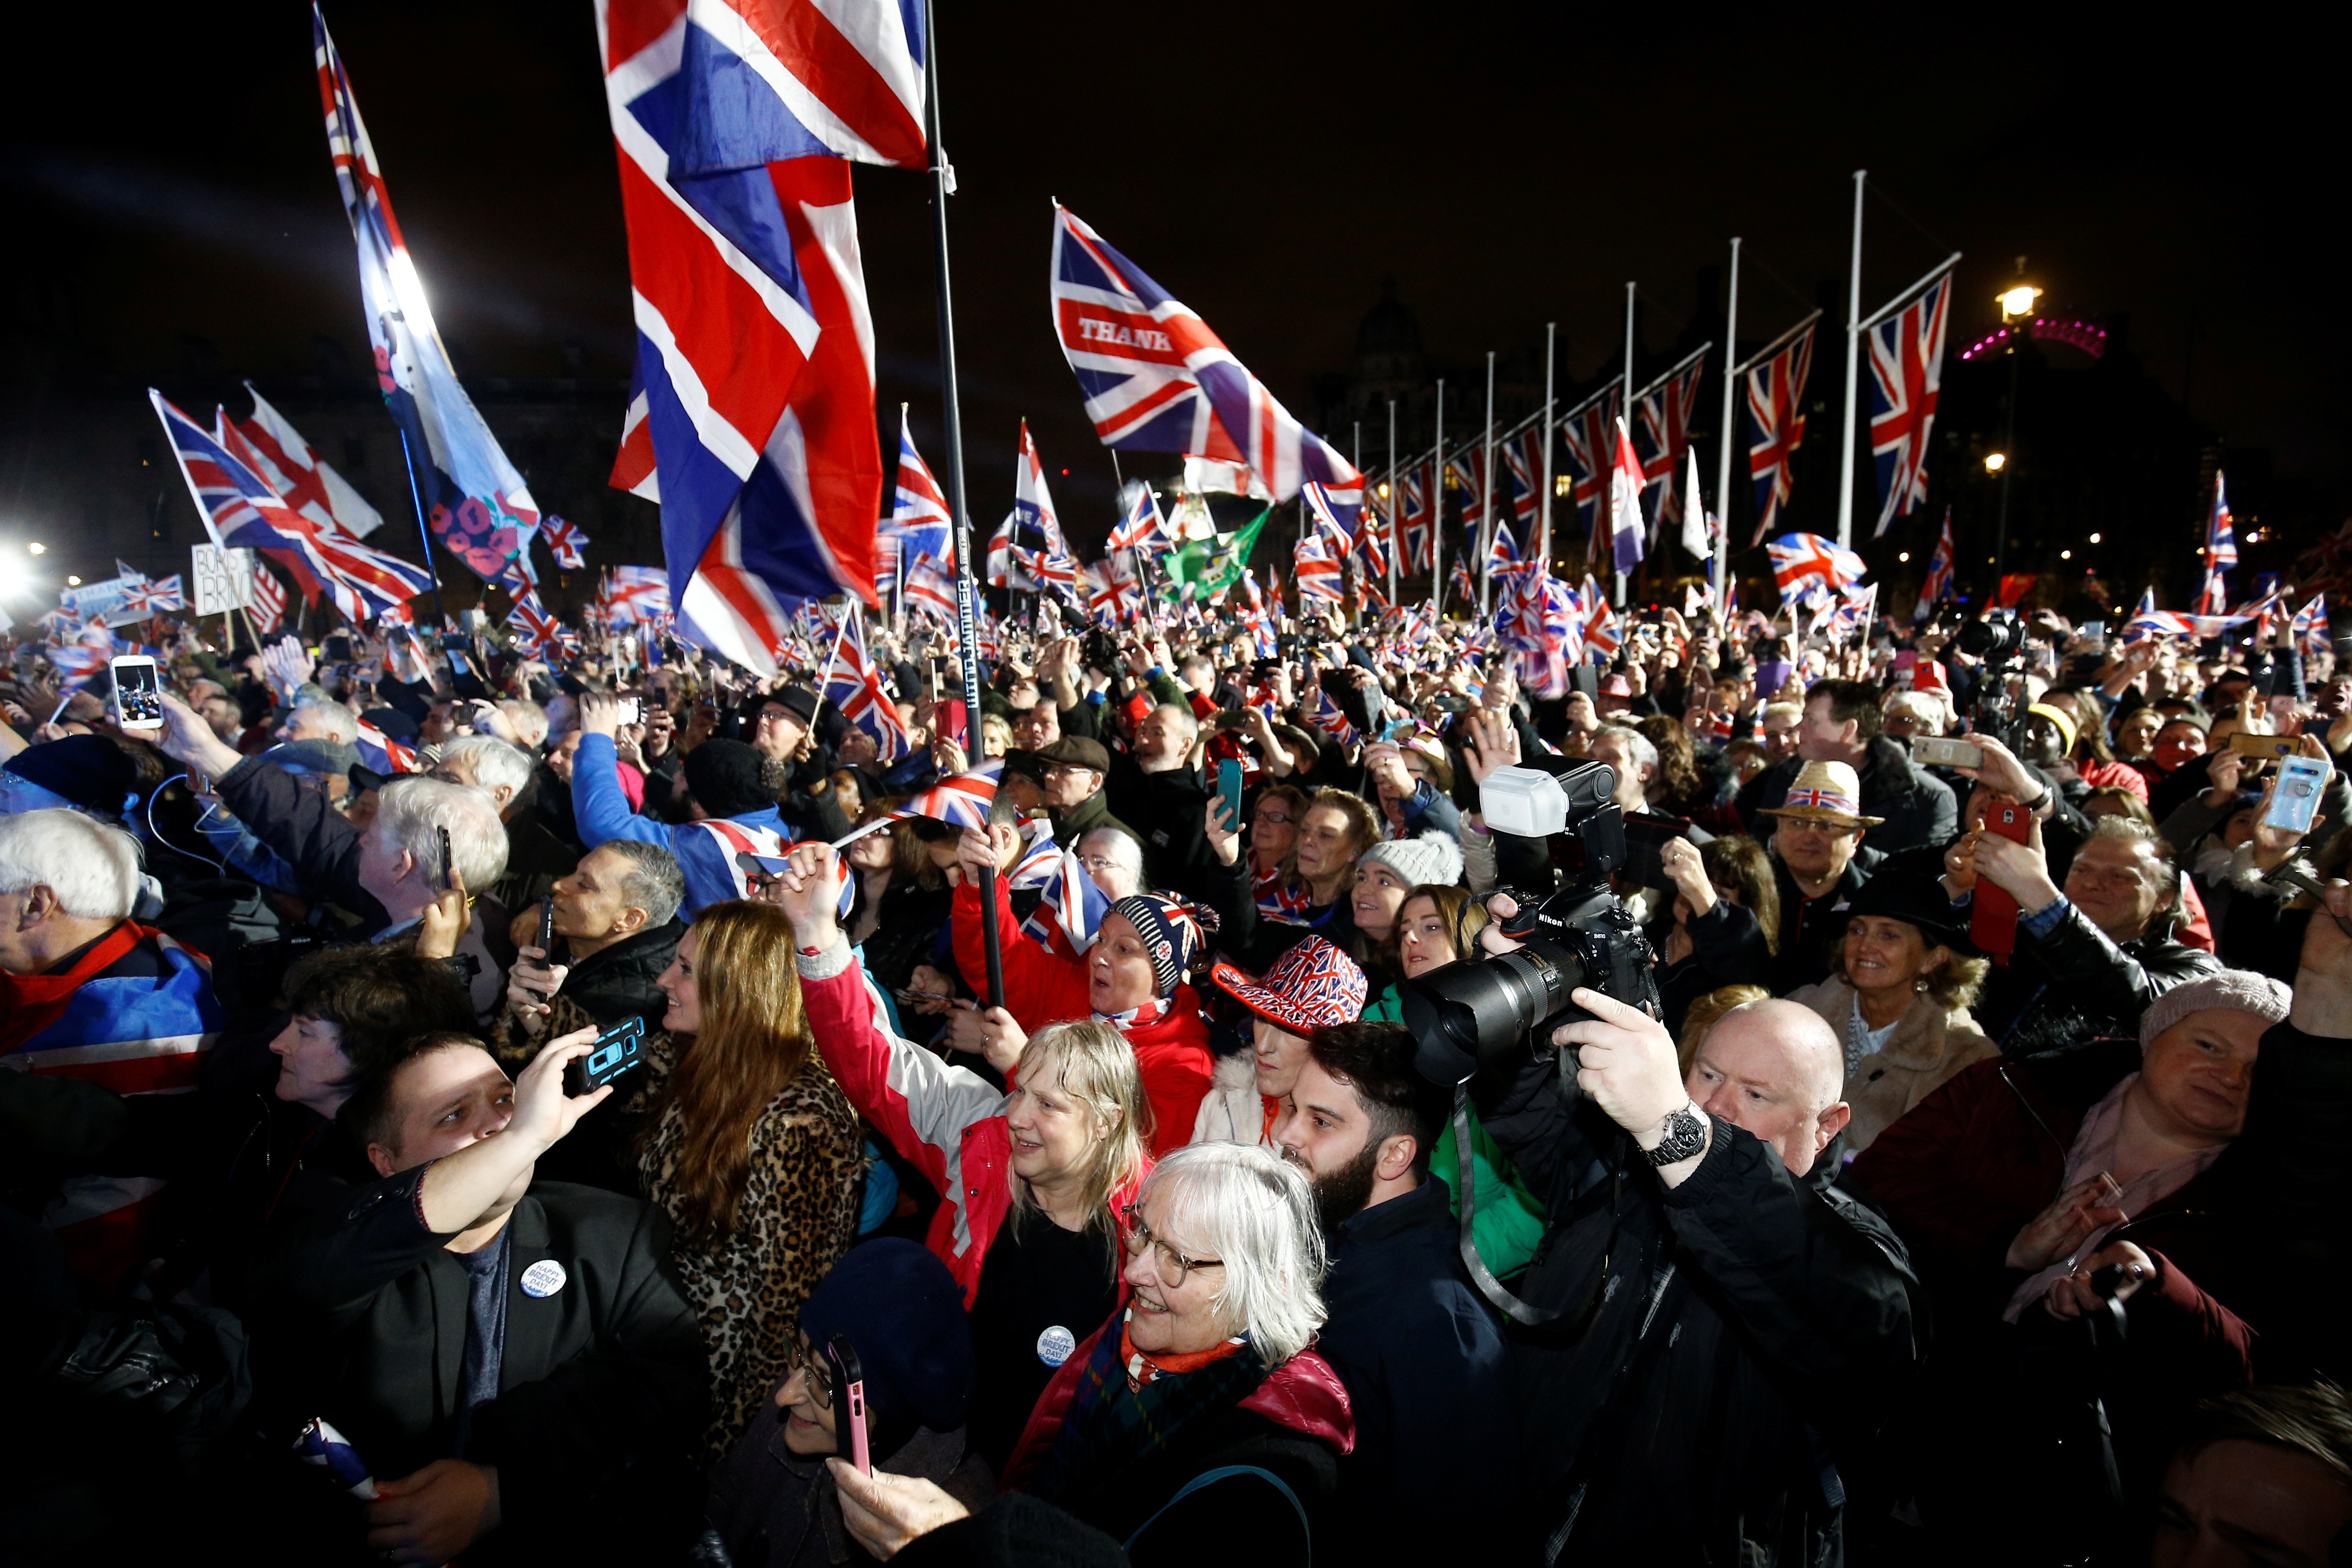 Brexit: Ξέφρενο γλέντι στη Βρετανία για την ιστορική έξοδο από την Ευρωπαϊκή Ένωση